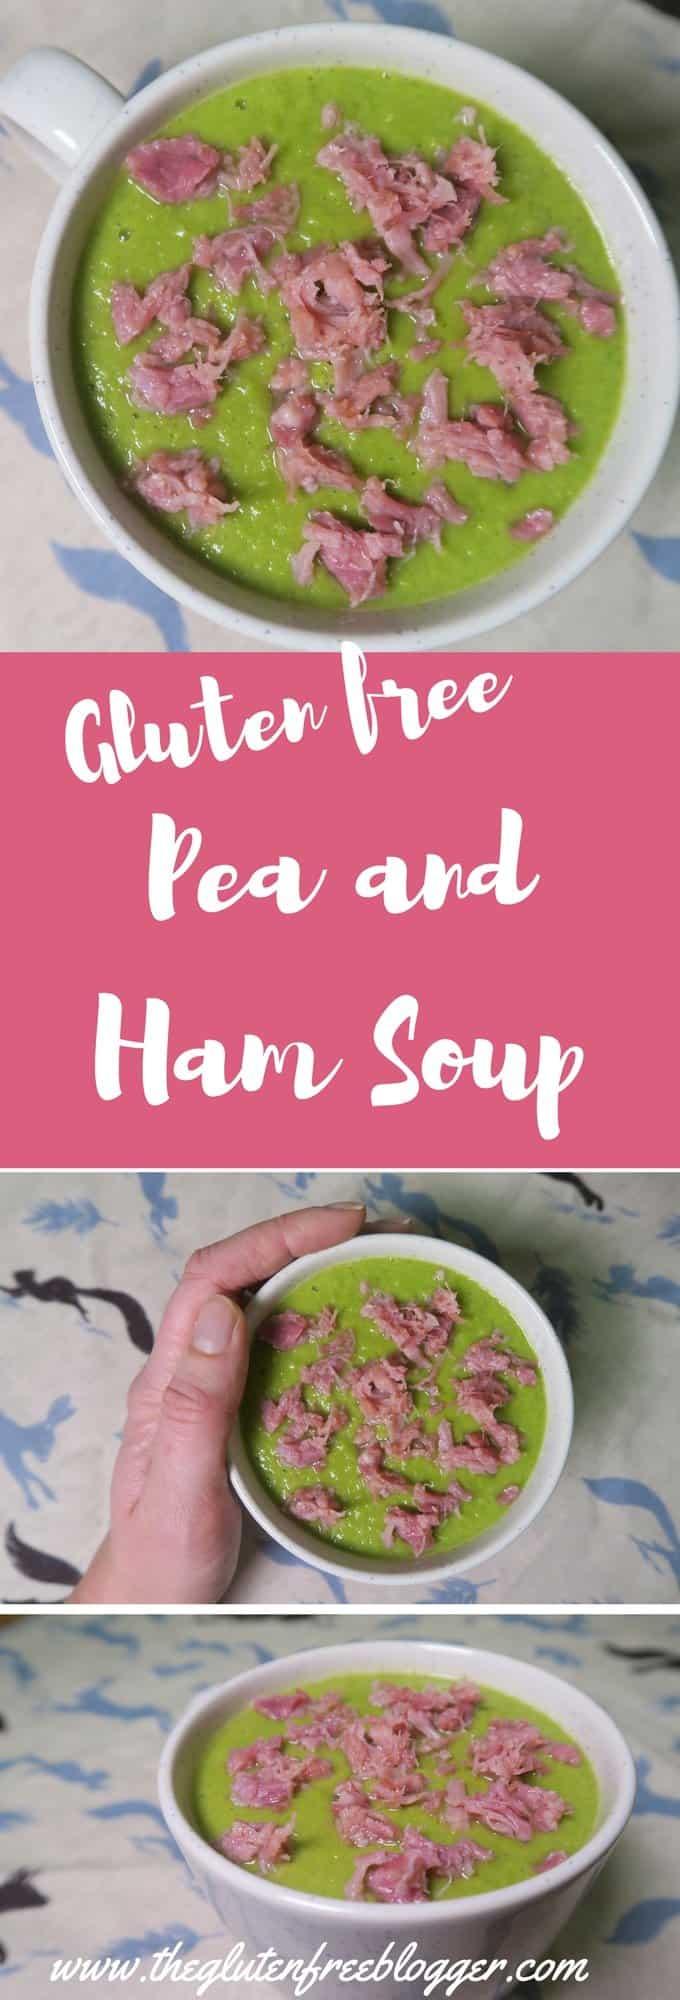 Gluten free pea and ham soup recipe - dairy free - www.theglutenfreeblogger.com